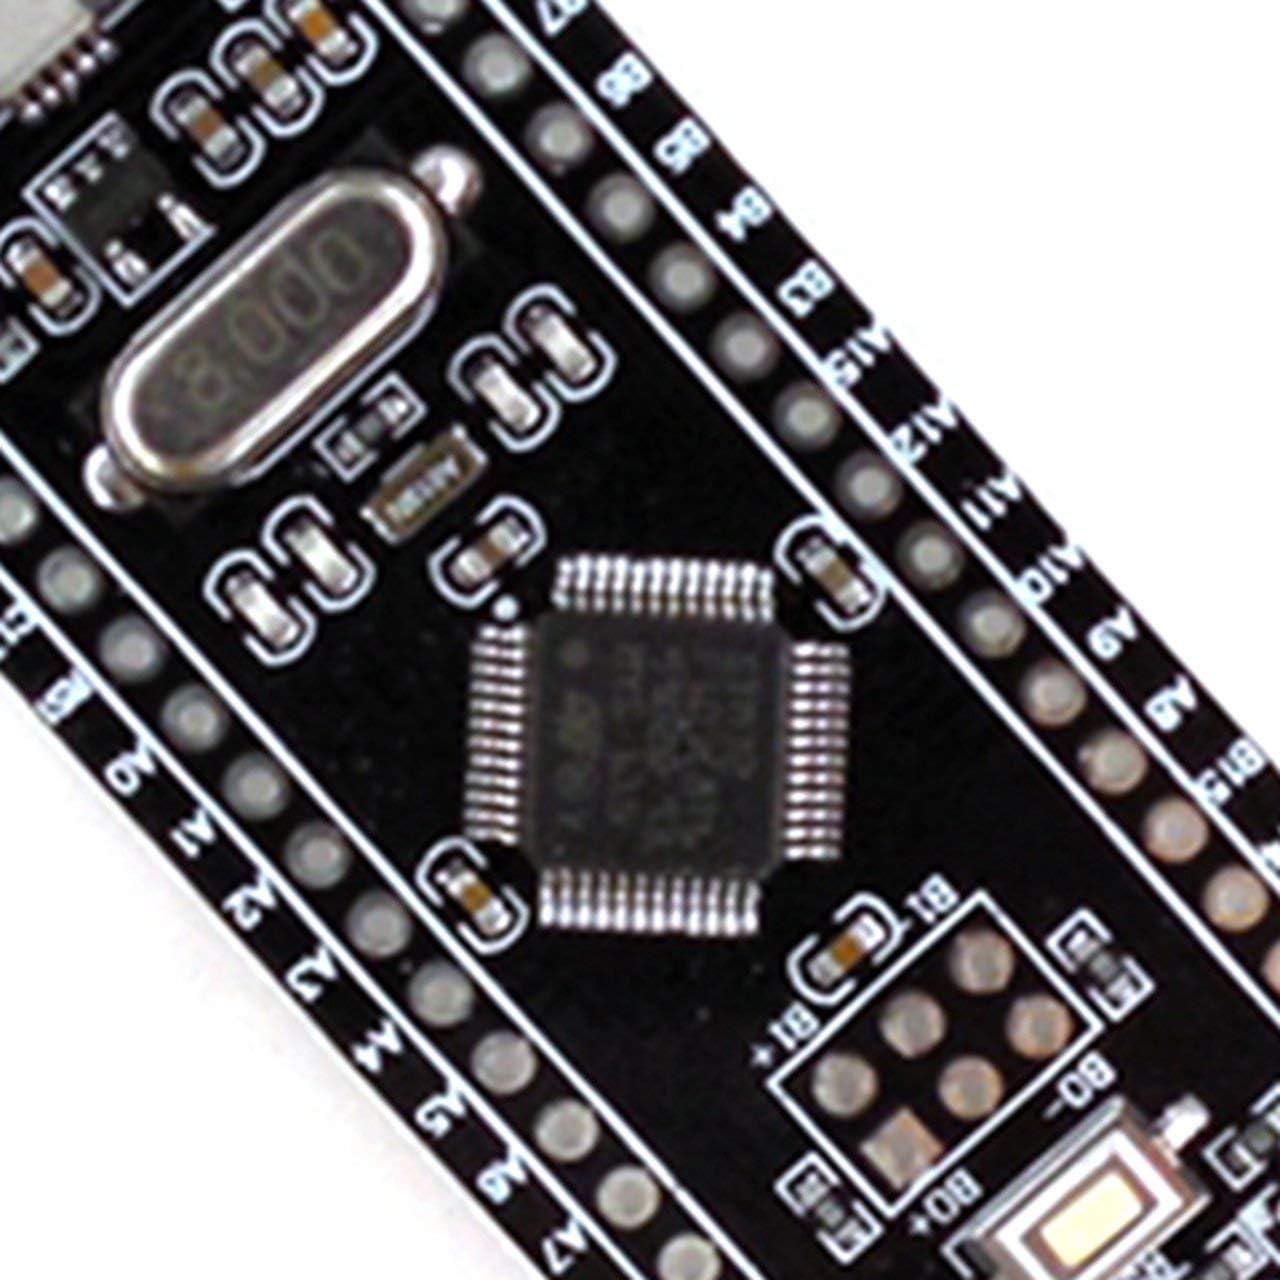 black /& yellow /& silver TY-55STM32F103C8T6 ARM STM32 Minimum System Development Board Module Micro USB controller ARM Learning Module Jasnyfall